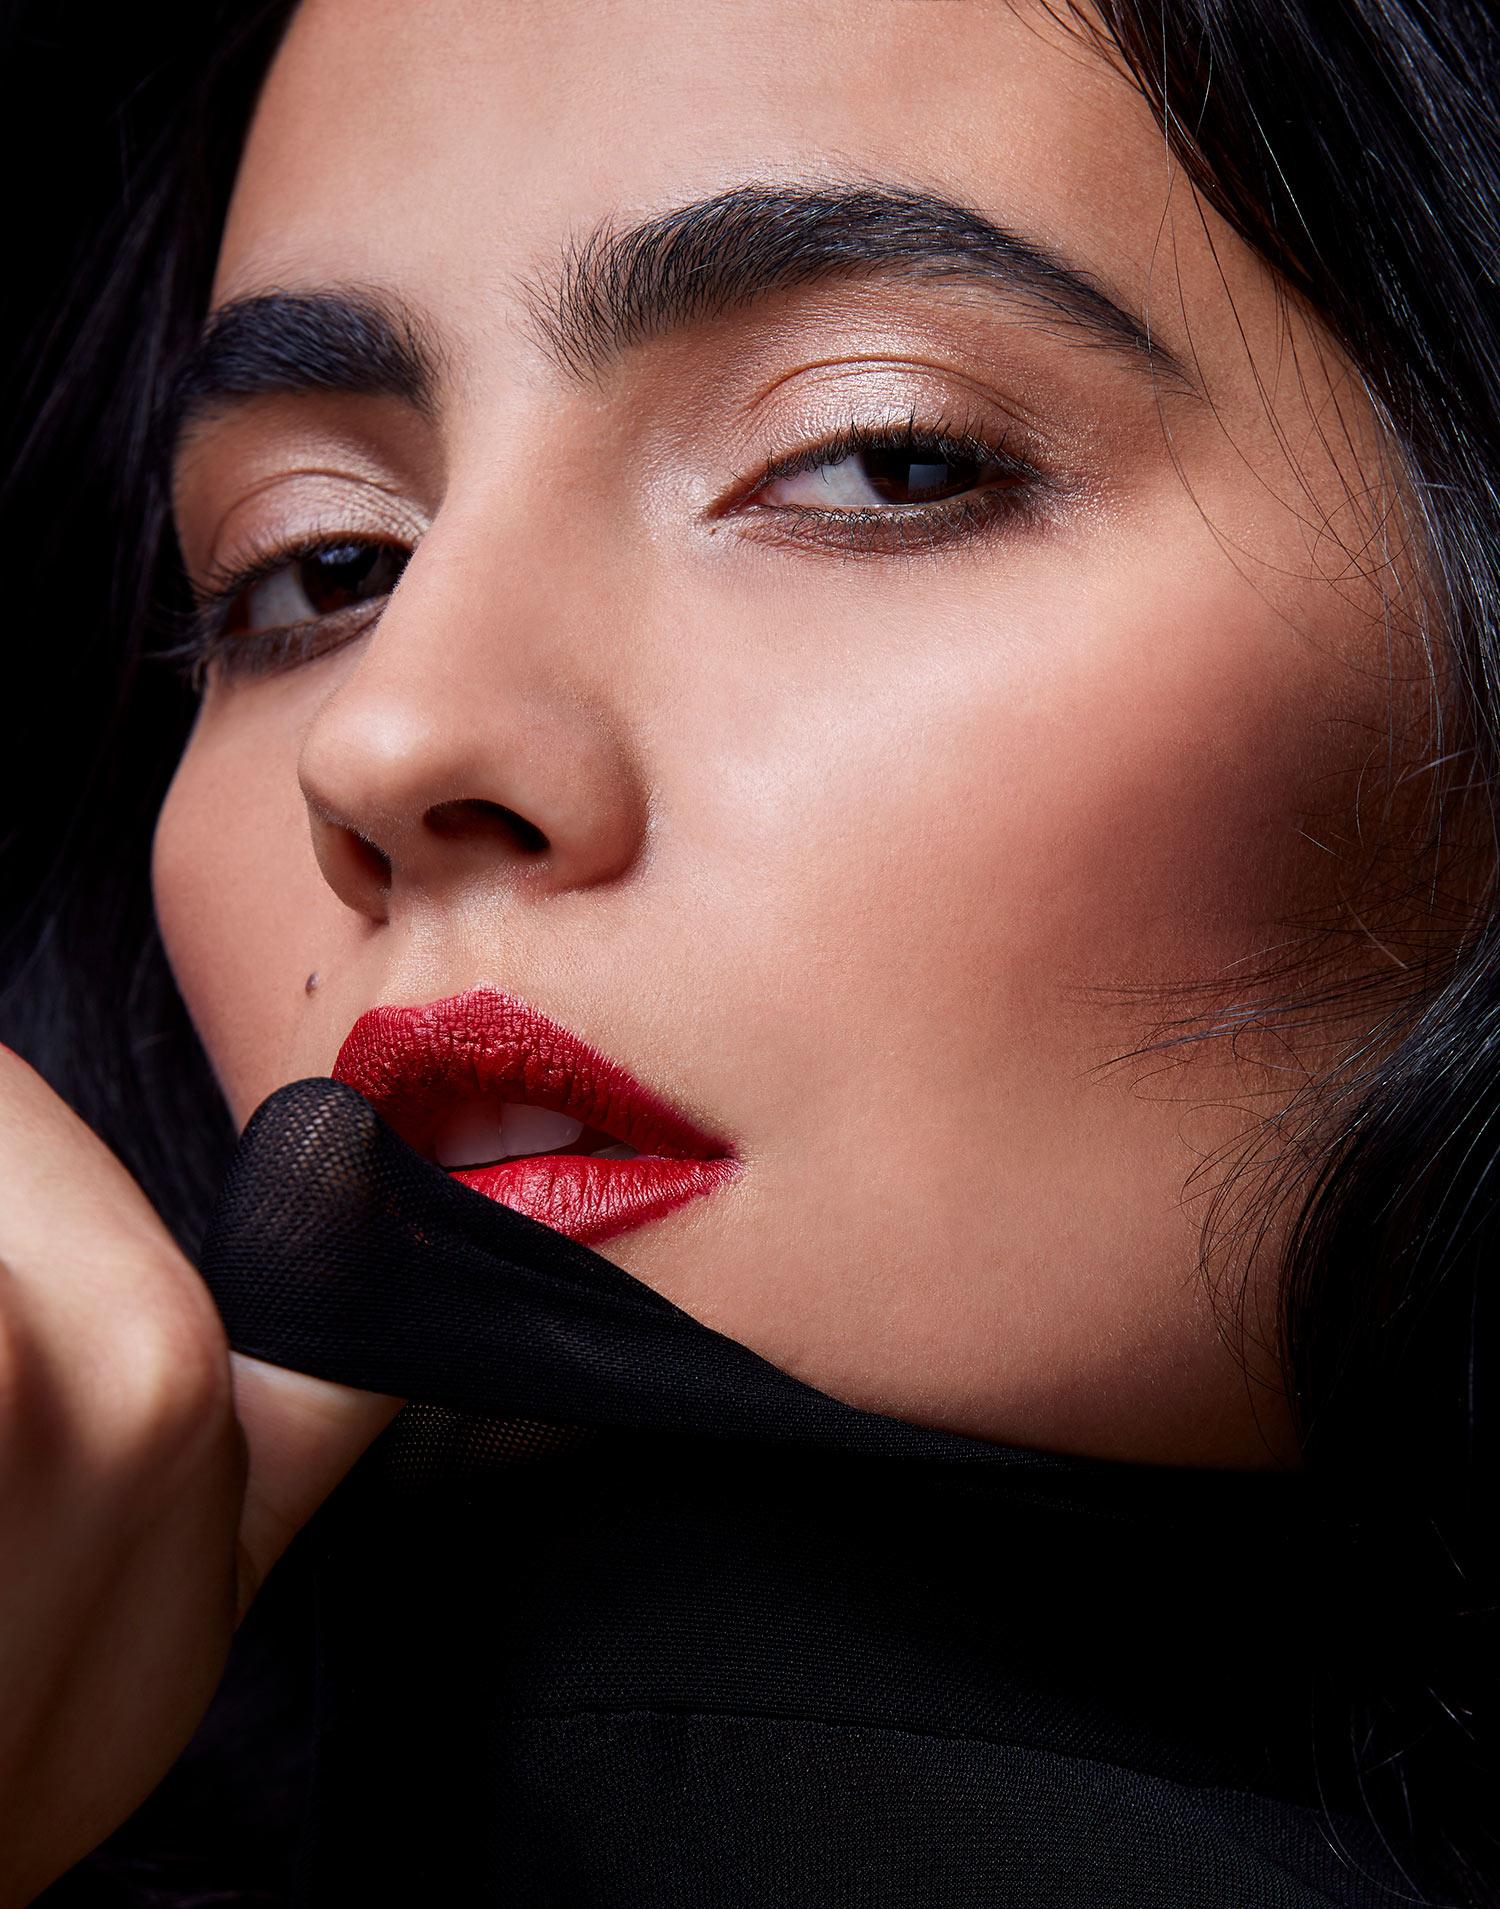 Scarlet Beauty -            Normal  0          false  false  false    EN-US  JA  X-NONE                                                                                                                                                                                                                                                                                                                                                                                                                                                                                                                                                                                                                                                                                                                                                                                                                                                       /* Style Definitions */ table.MsoNormalTable {mso-style-name: